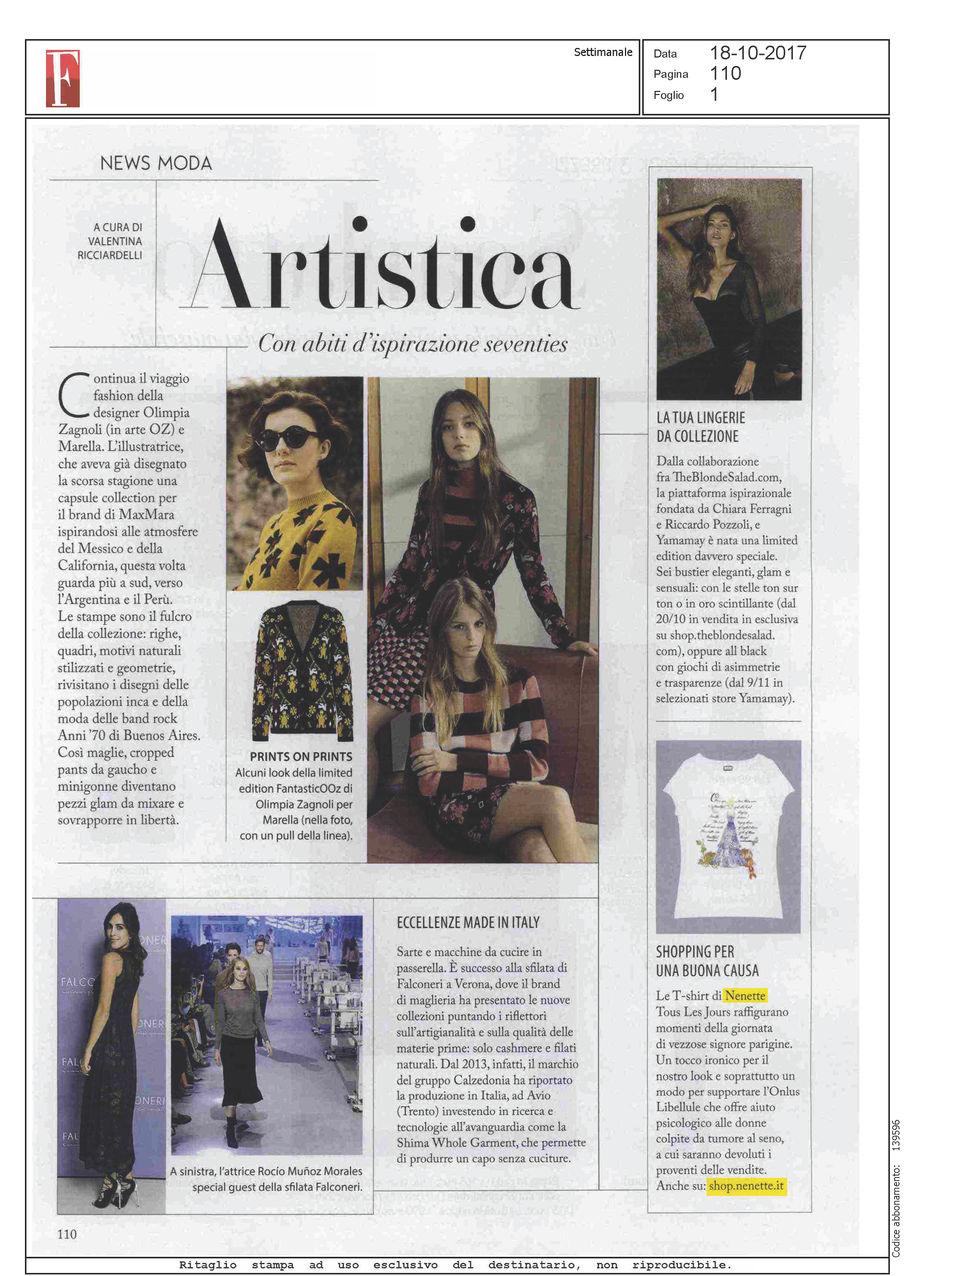 F Magazine - 18.10.17